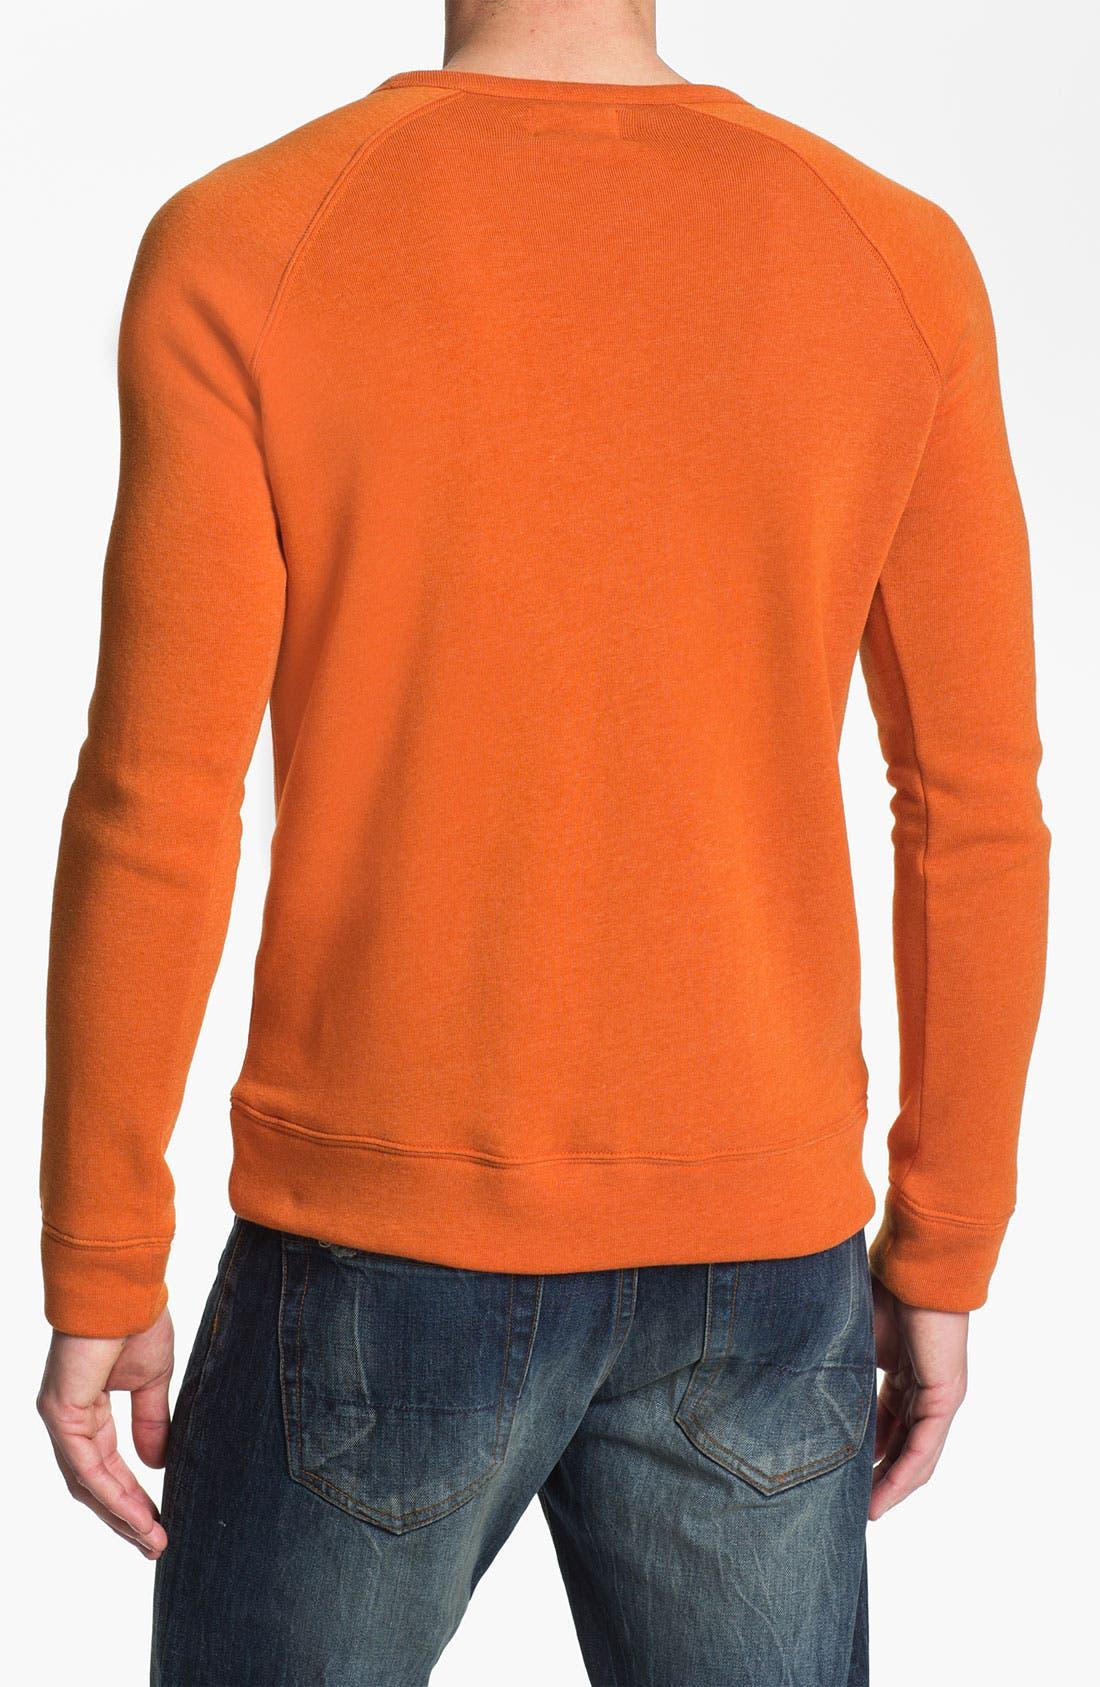 Lofty Creature Comforts Crewneck Sweatshirt,                             Alternate thumbnail 2, color,                             Apricot